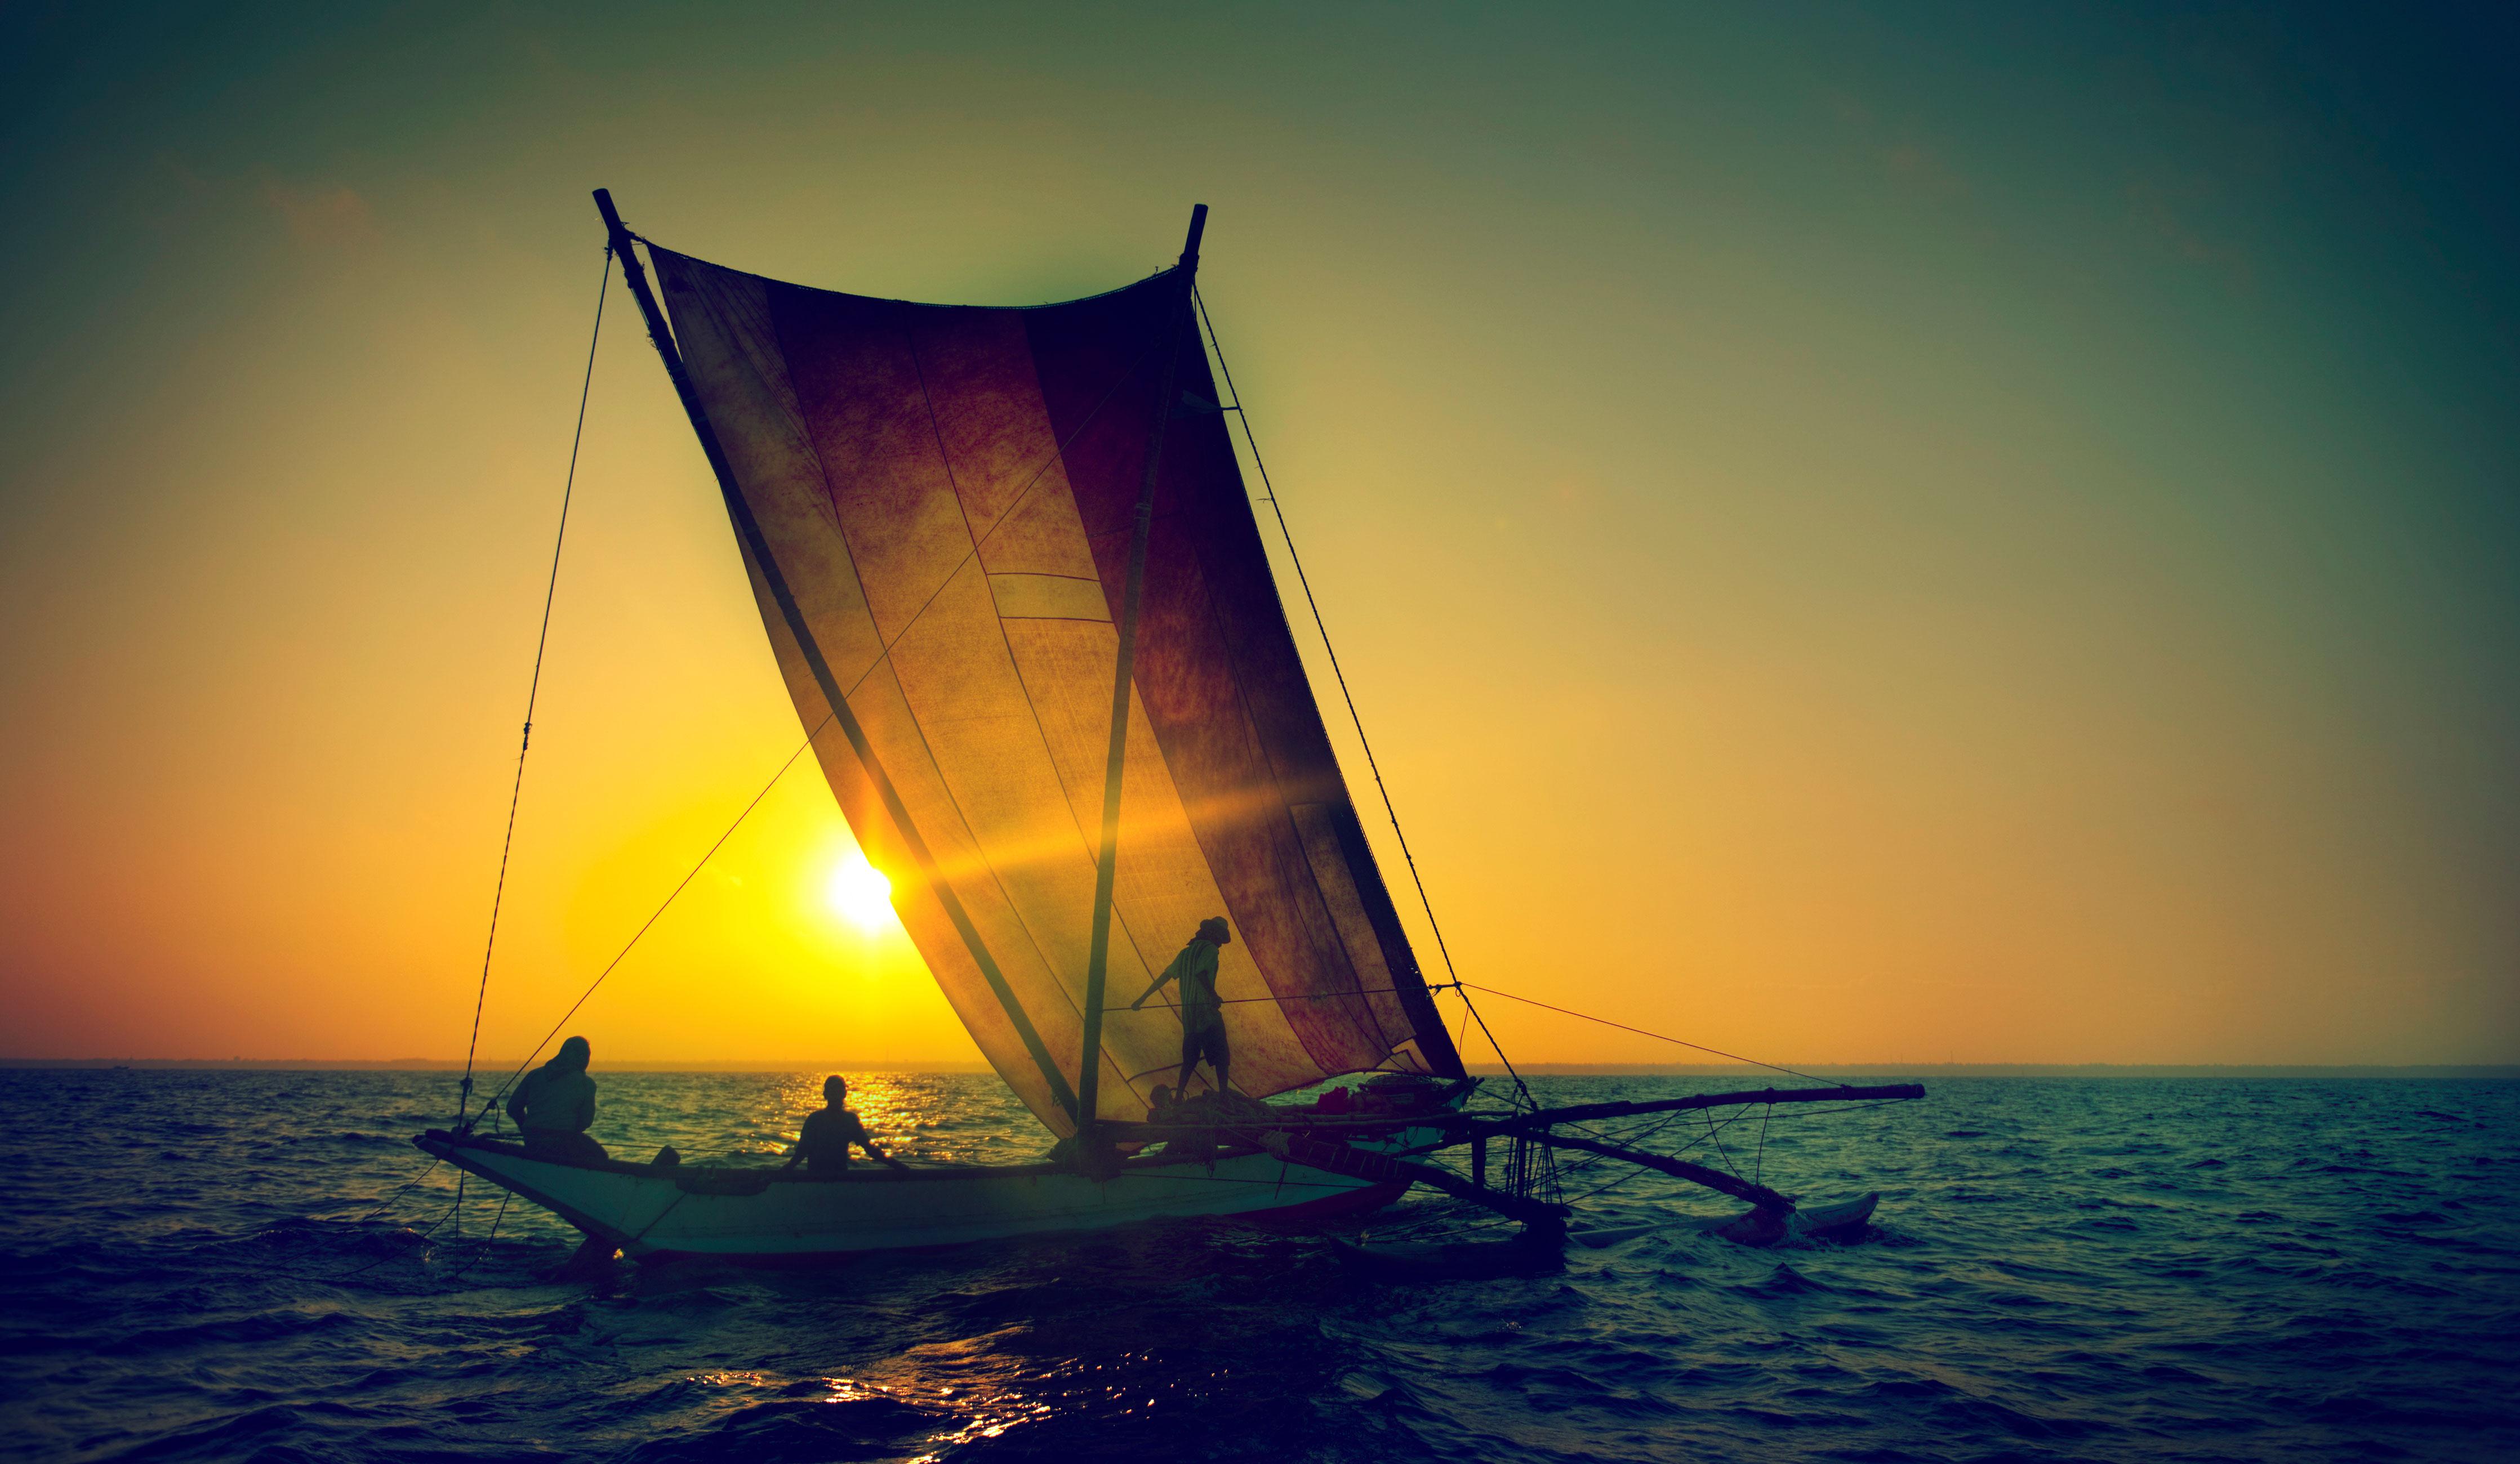 NGÀY 4: MAAFUSHI - CATAMARAN SAILING TRIP(ĂN SÁNG, TỐI)